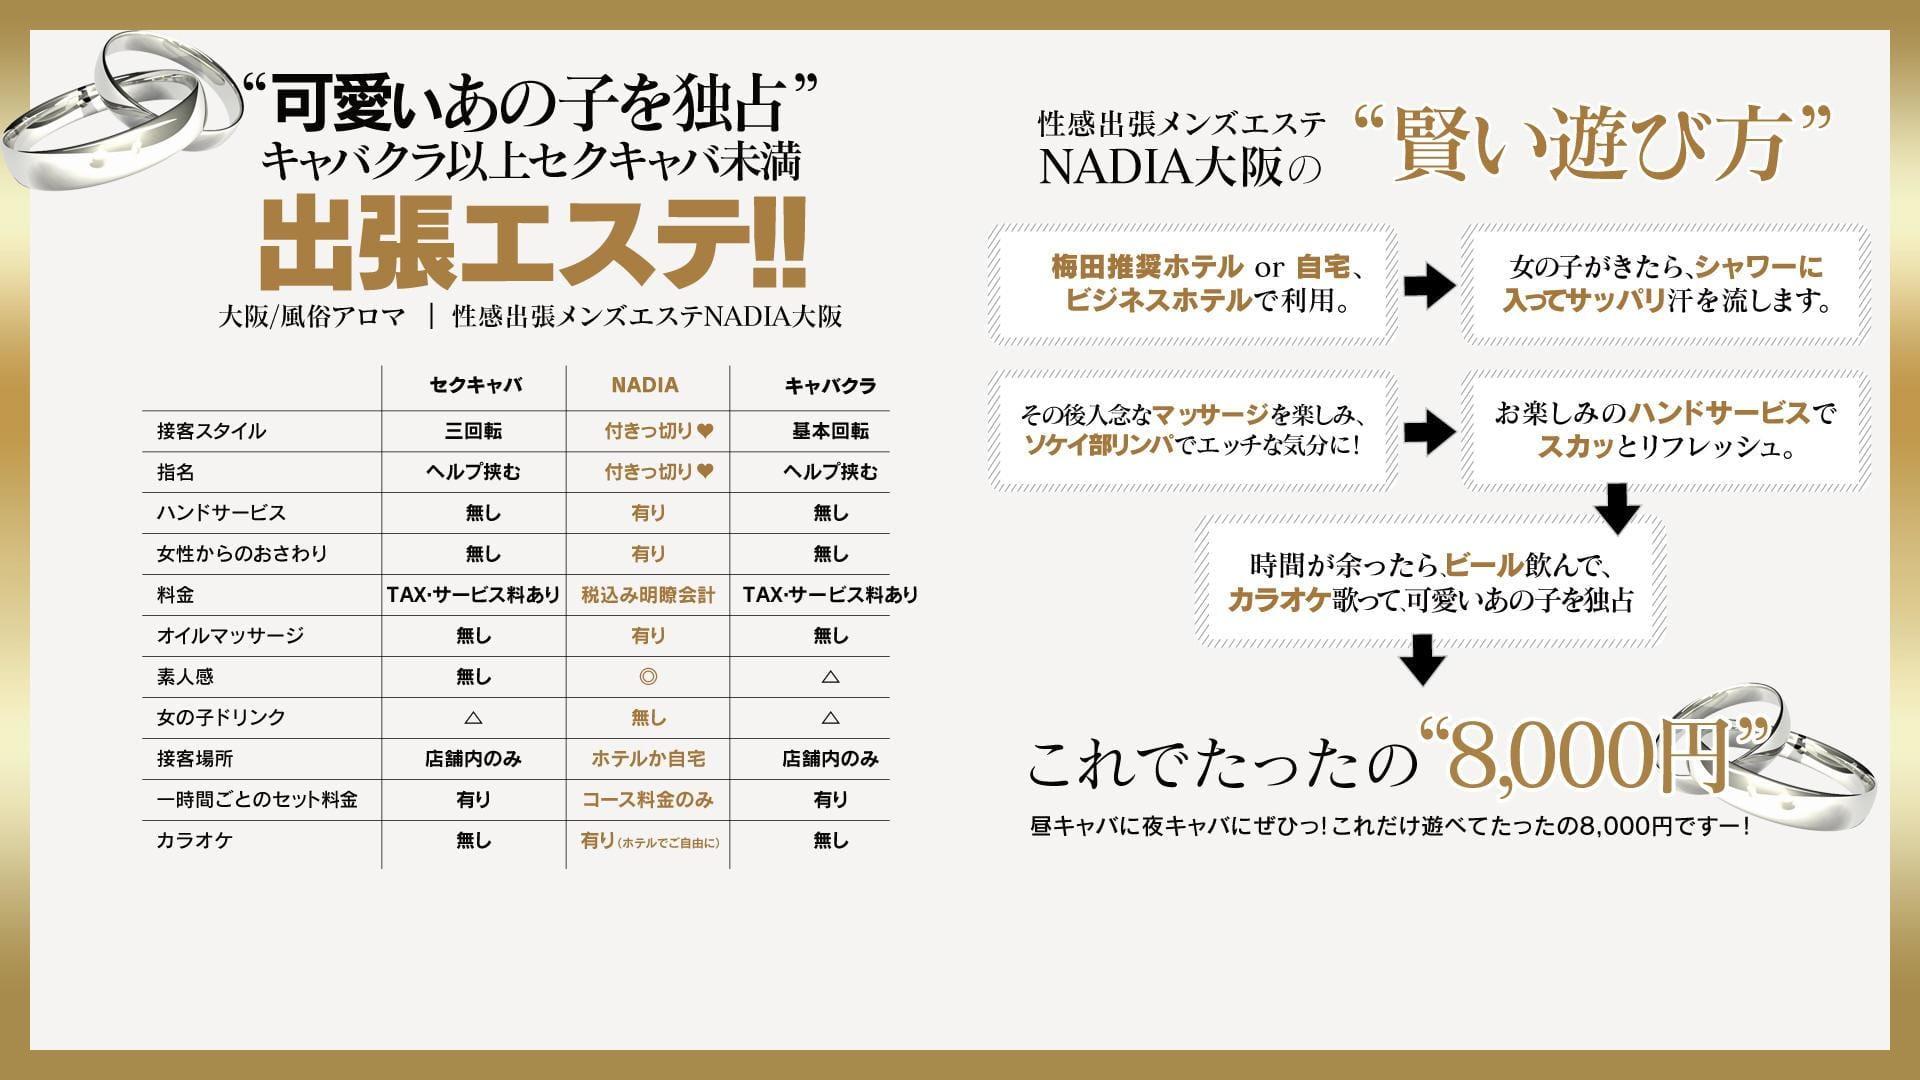 NADIA大阪店(ナディア大阪店)